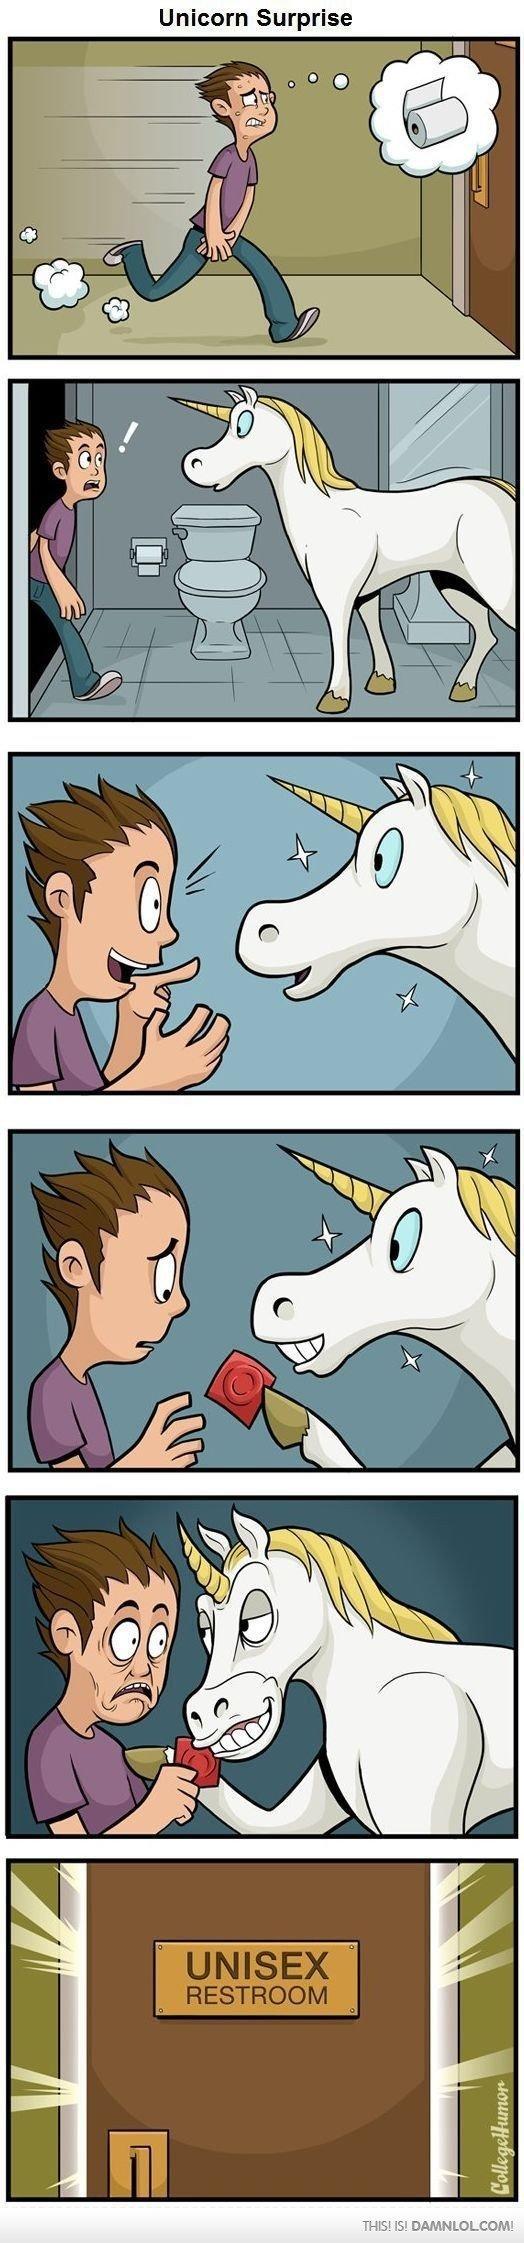 Unicorn Surprise. . Unicorn Surprise THIS! DAMN LILIUM!. Why do you need a condom if all unicorns are male?